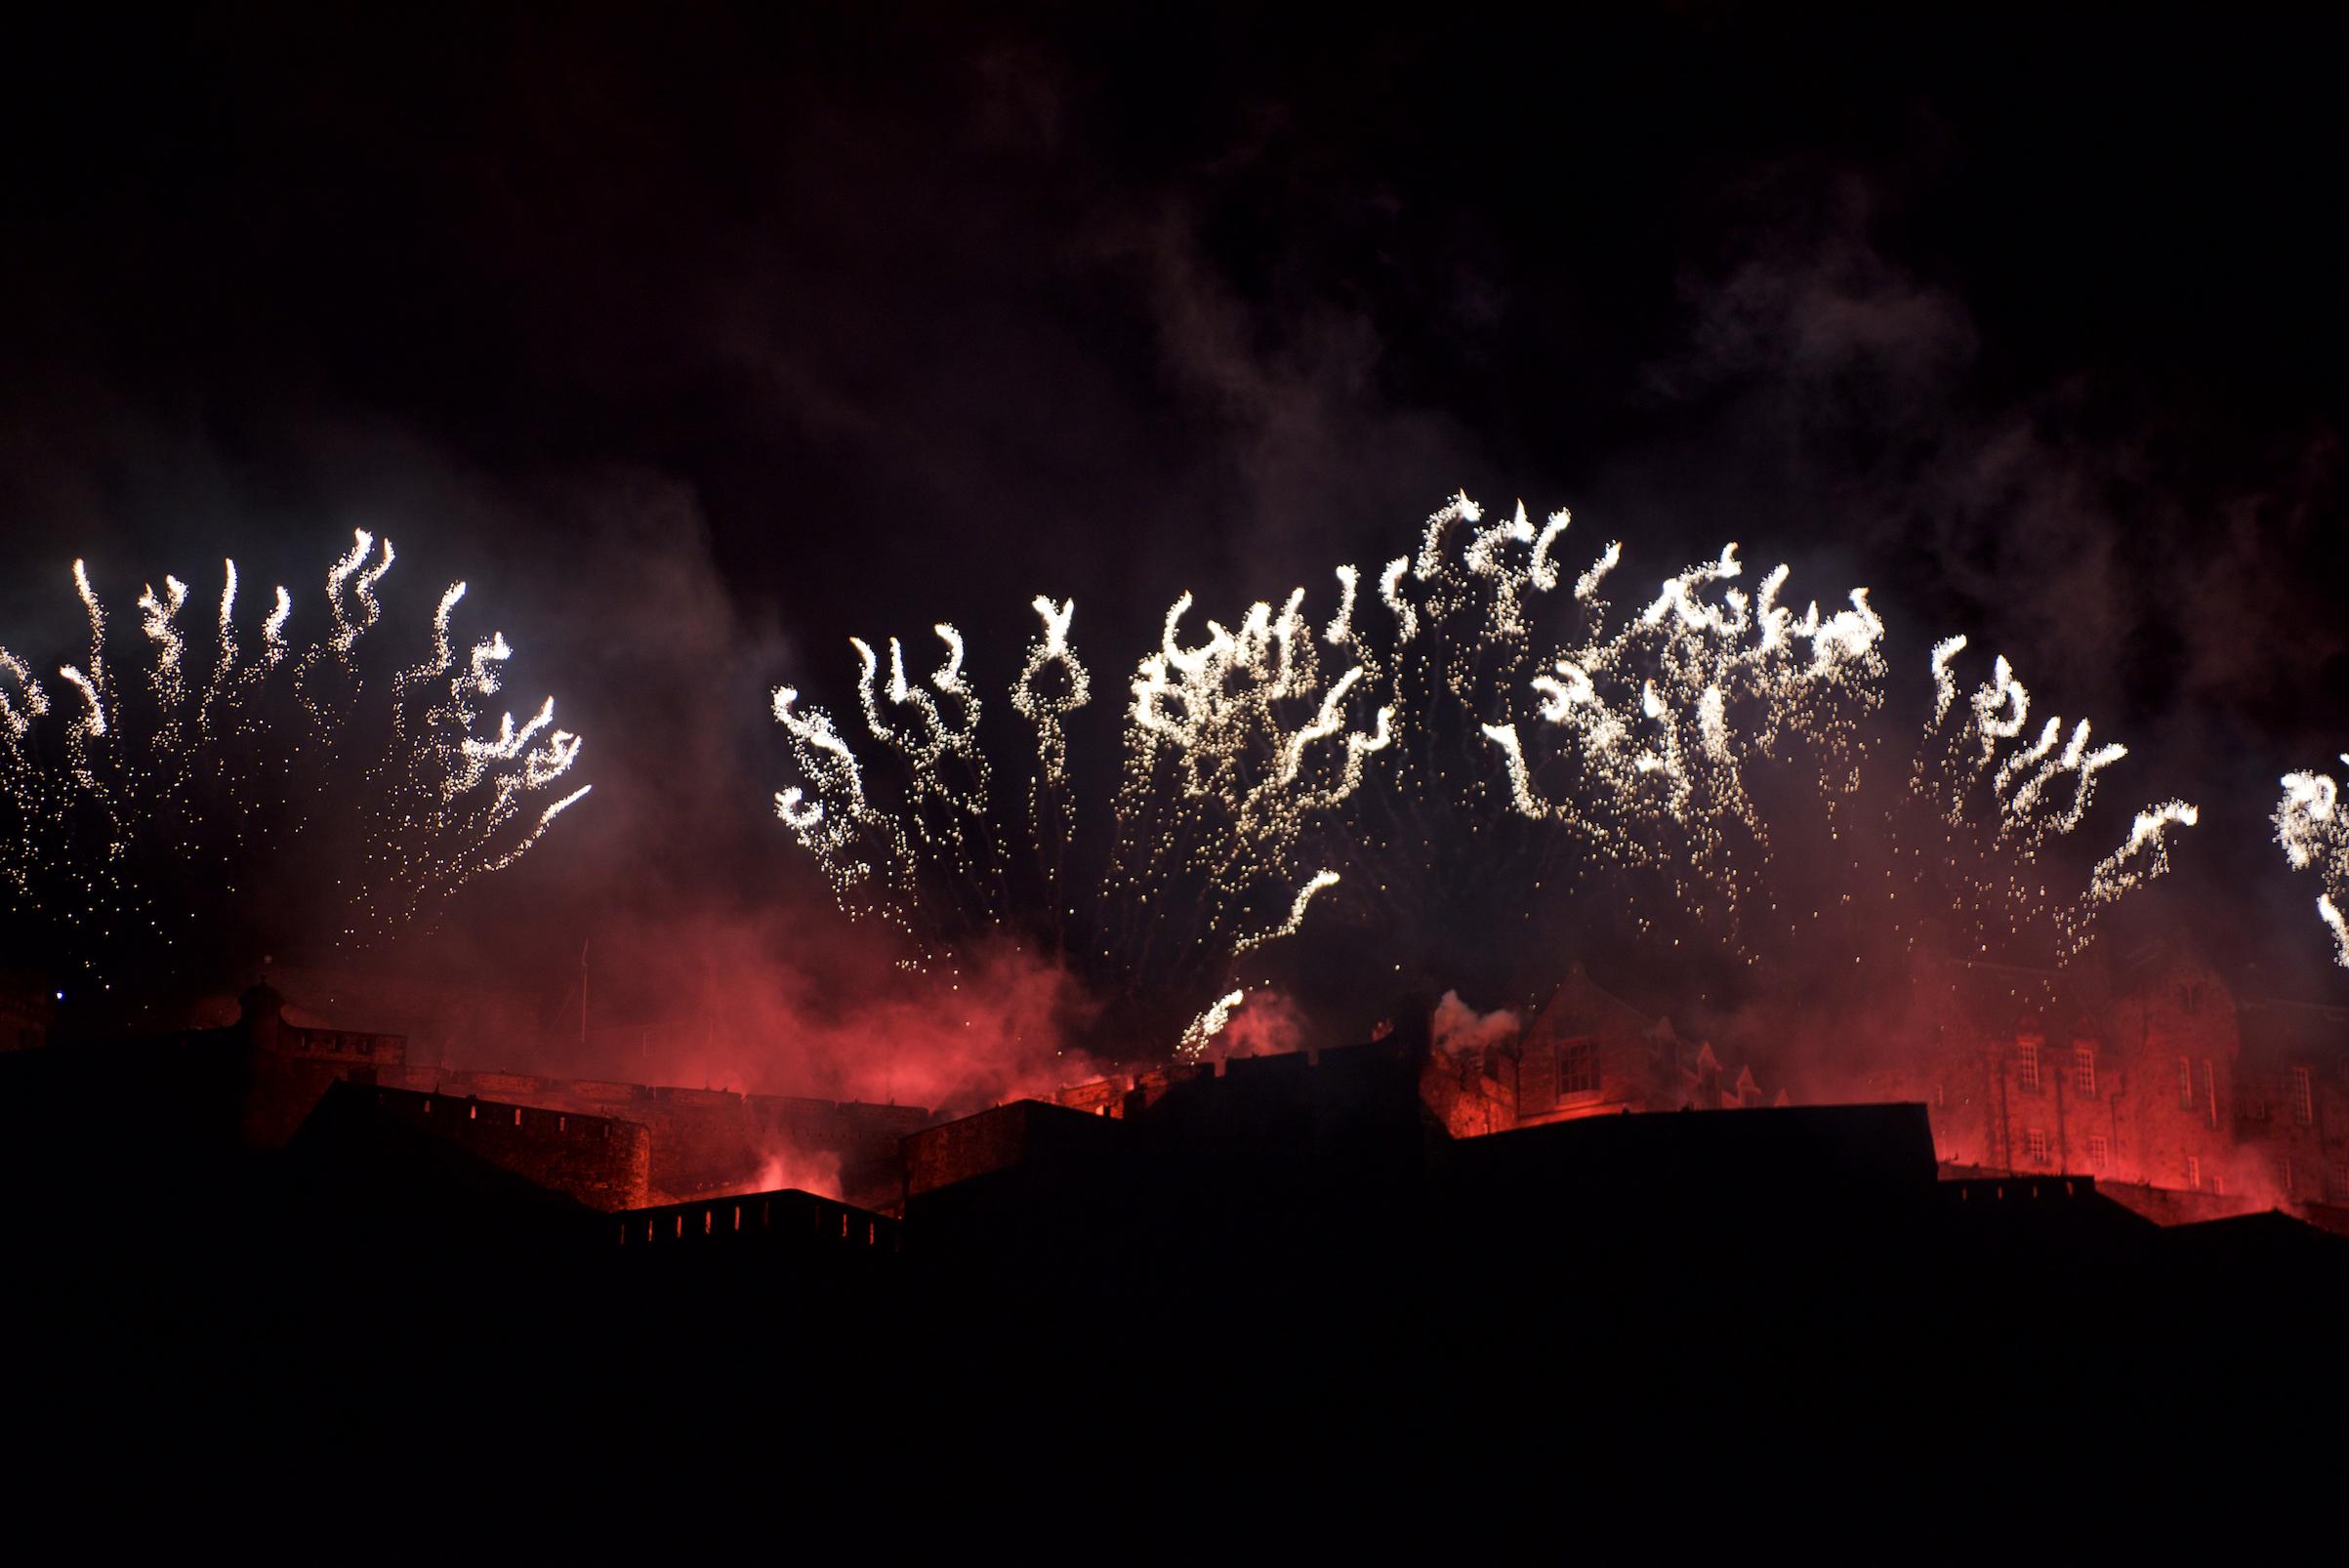 grand-finale-of-the-2017-international-festival-virgin-money-fireworks-concert-ross-bandstand-princes-street-gardens-edinburgh-uk-monday-28th-august-2017-8